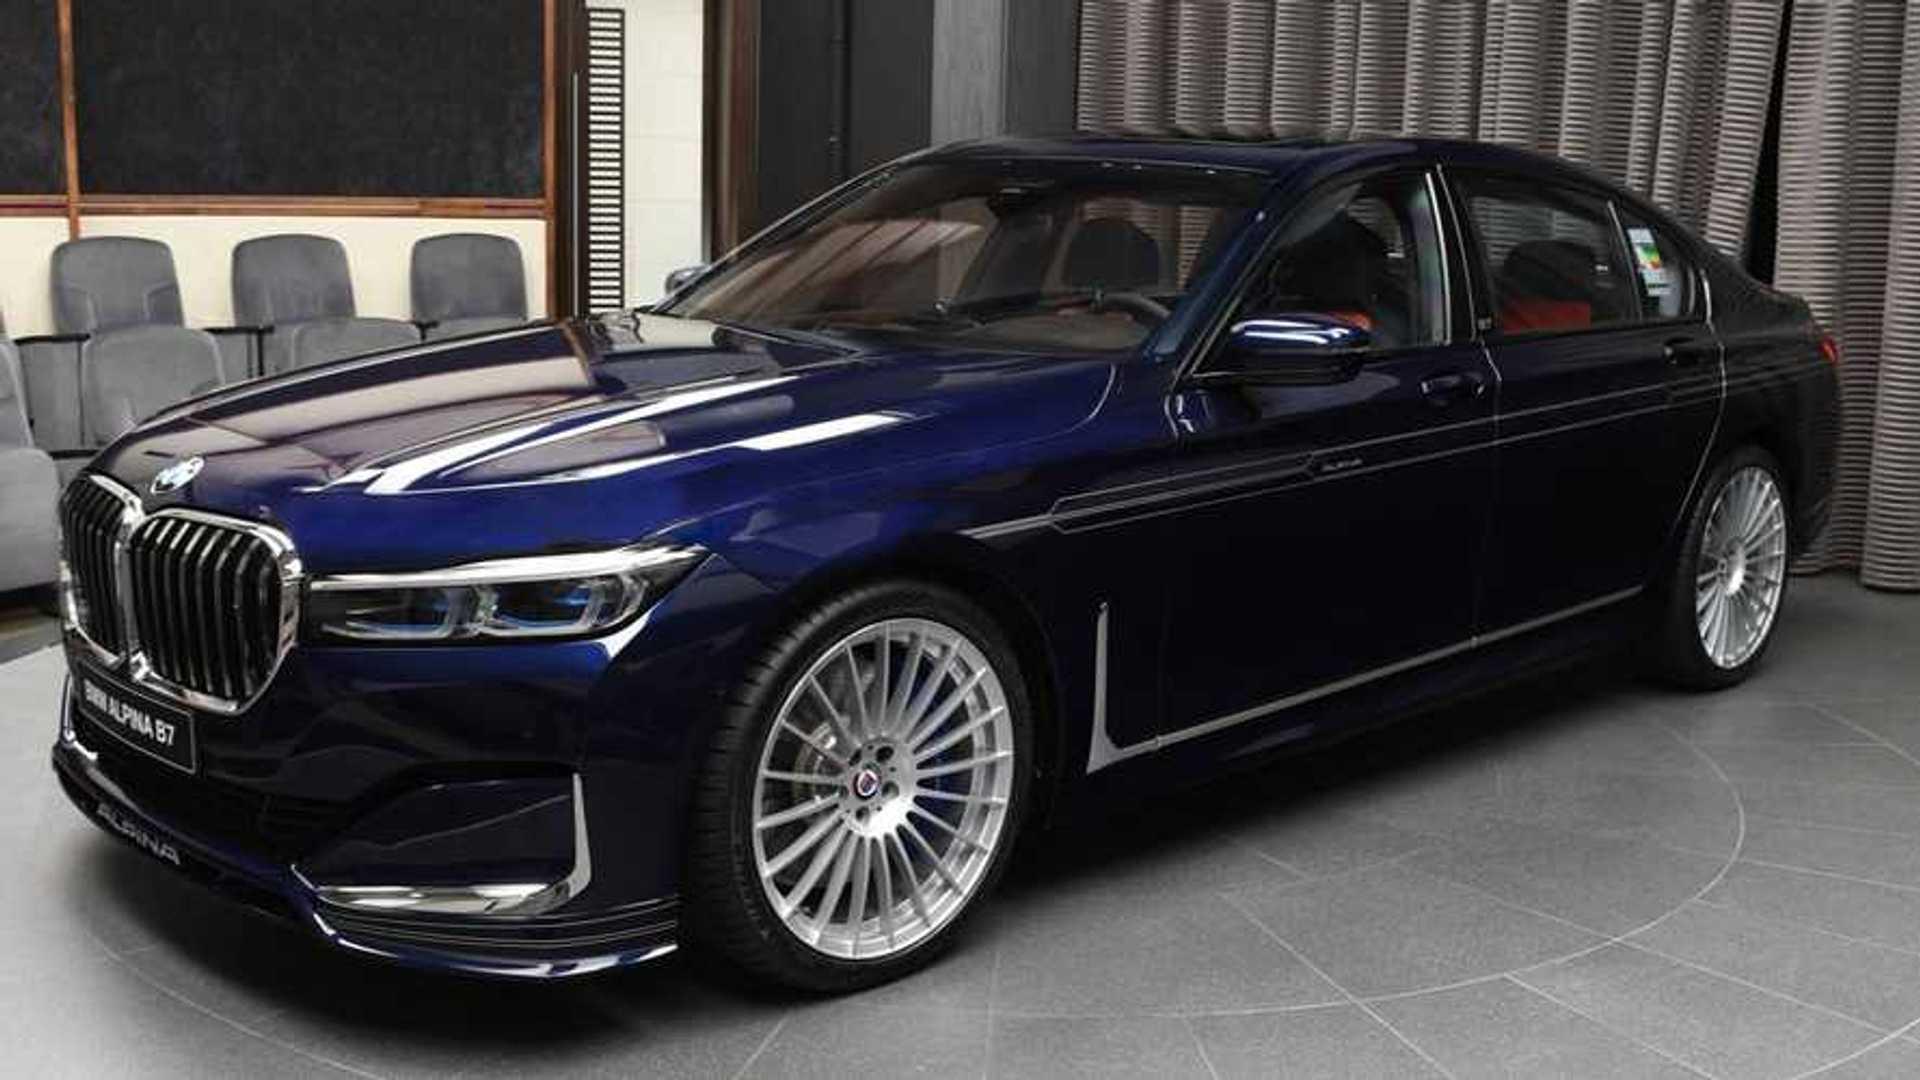 2020 Alpina B7 Is Opulently Elegant According To Bmw Dealer